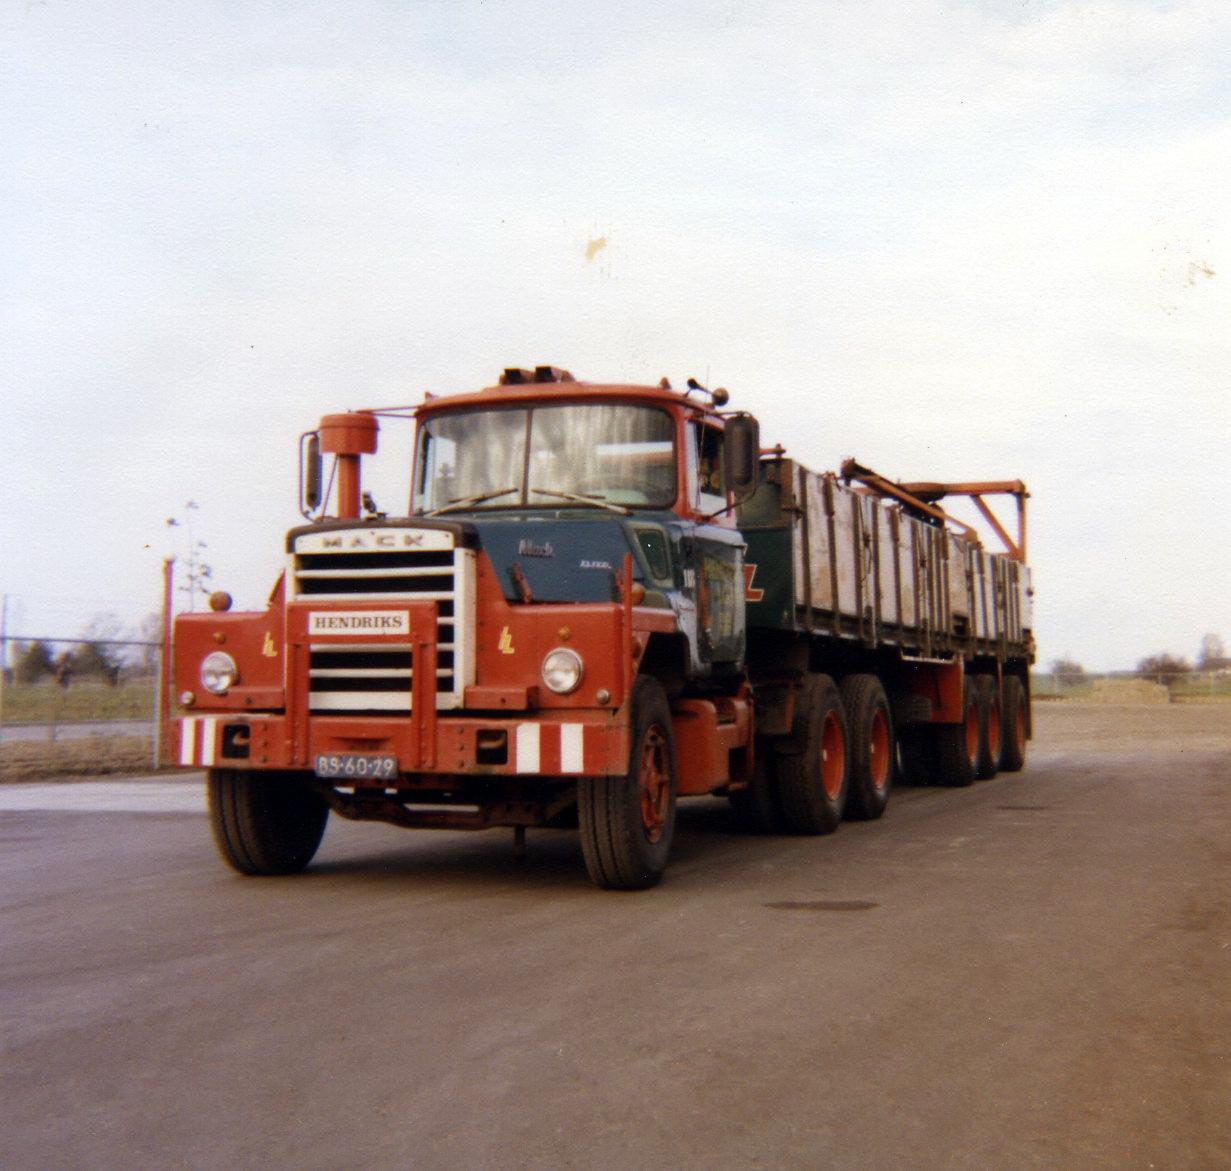 Hendriks-Lobith-Mack-DM609-S-BS6029